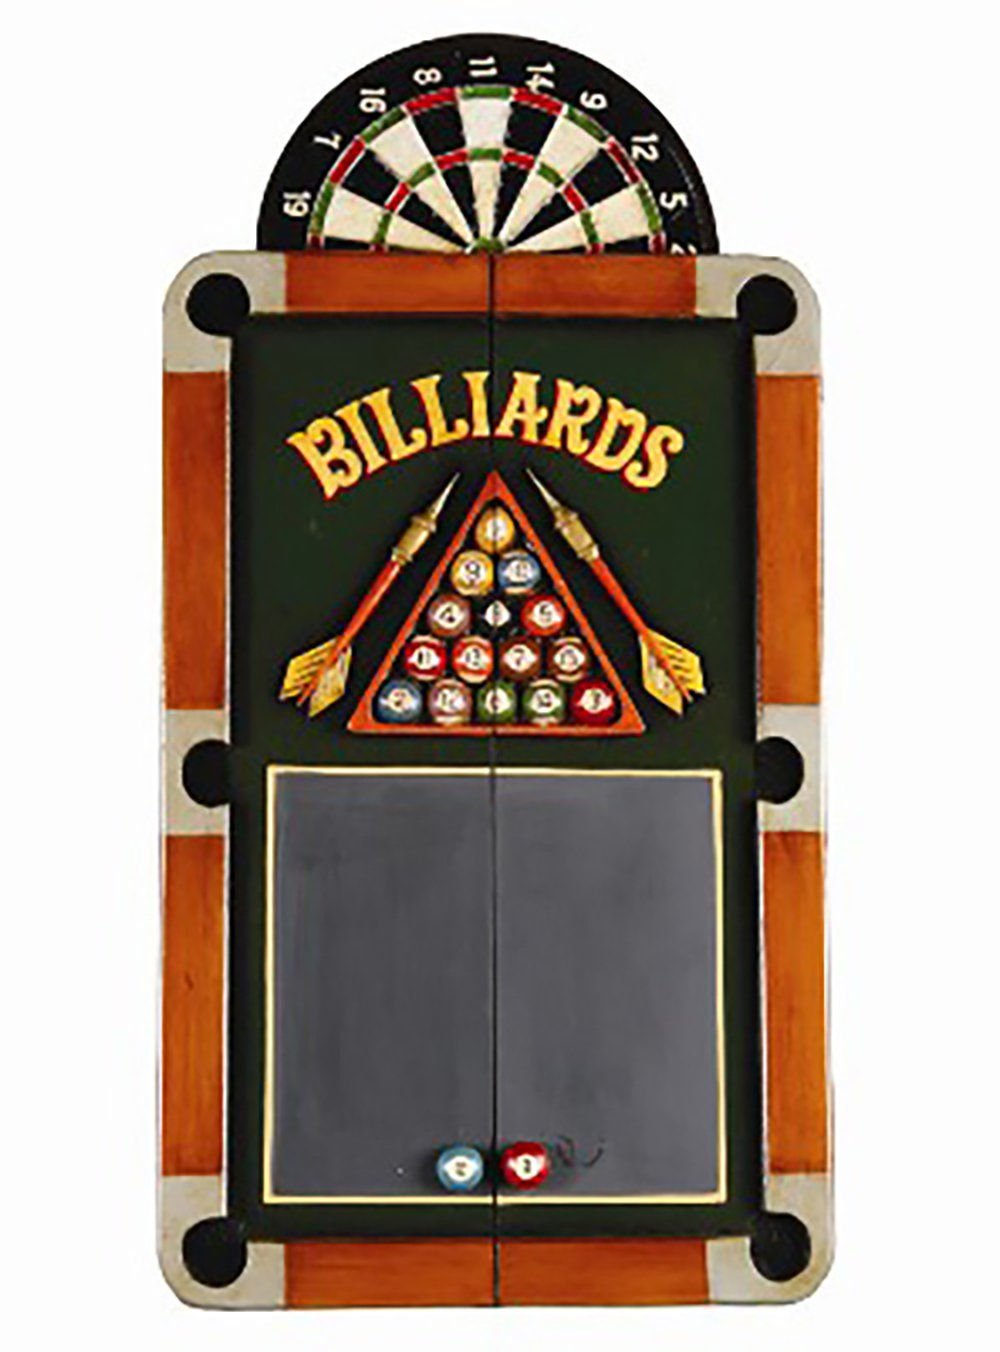 RAM Gameroom Colorful Billiards Theme Dartboard Cabinet